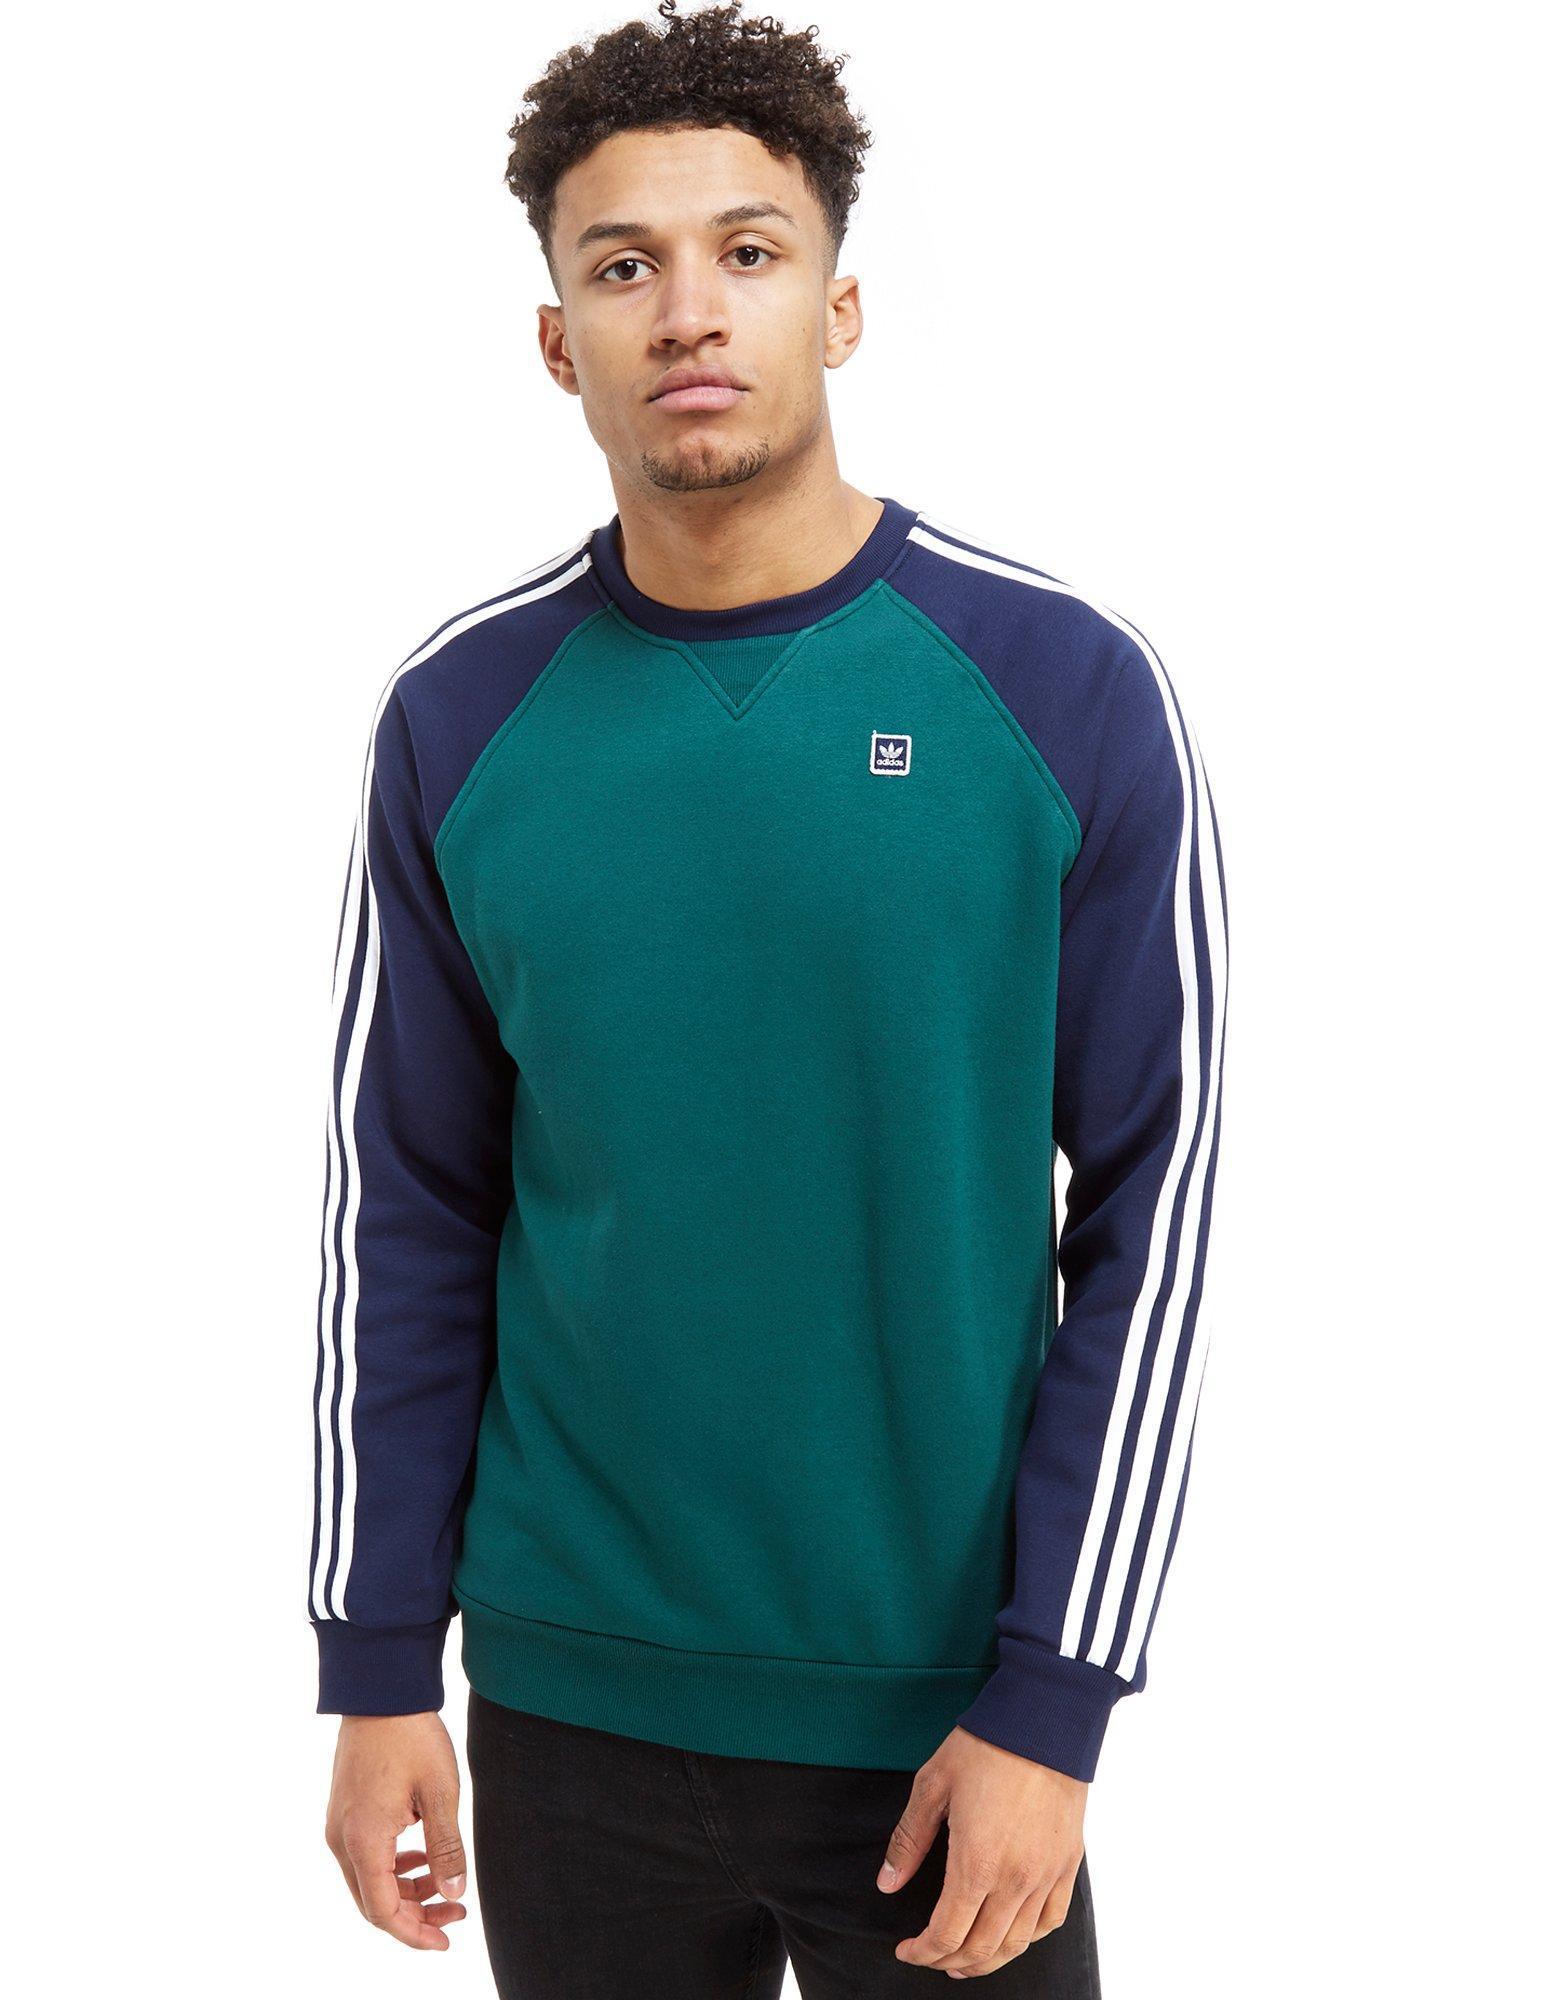 ce8b838f83e5 adidas Originals Skateboarding Raglan Crew Sweatshirt in Blue for ...